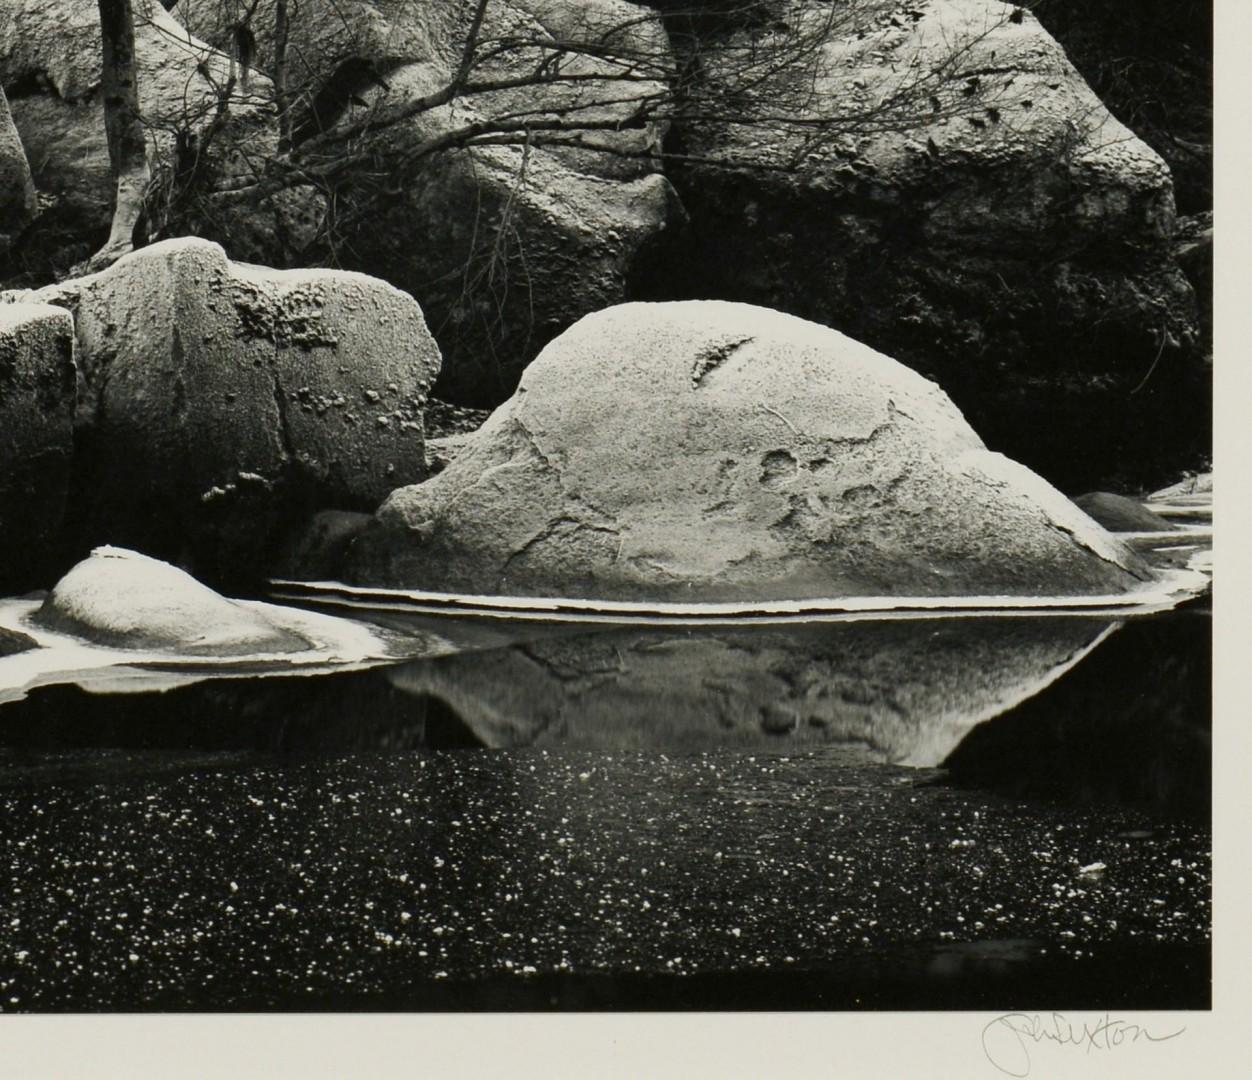 Lot 405: John Sexton Gelatin Silver Print